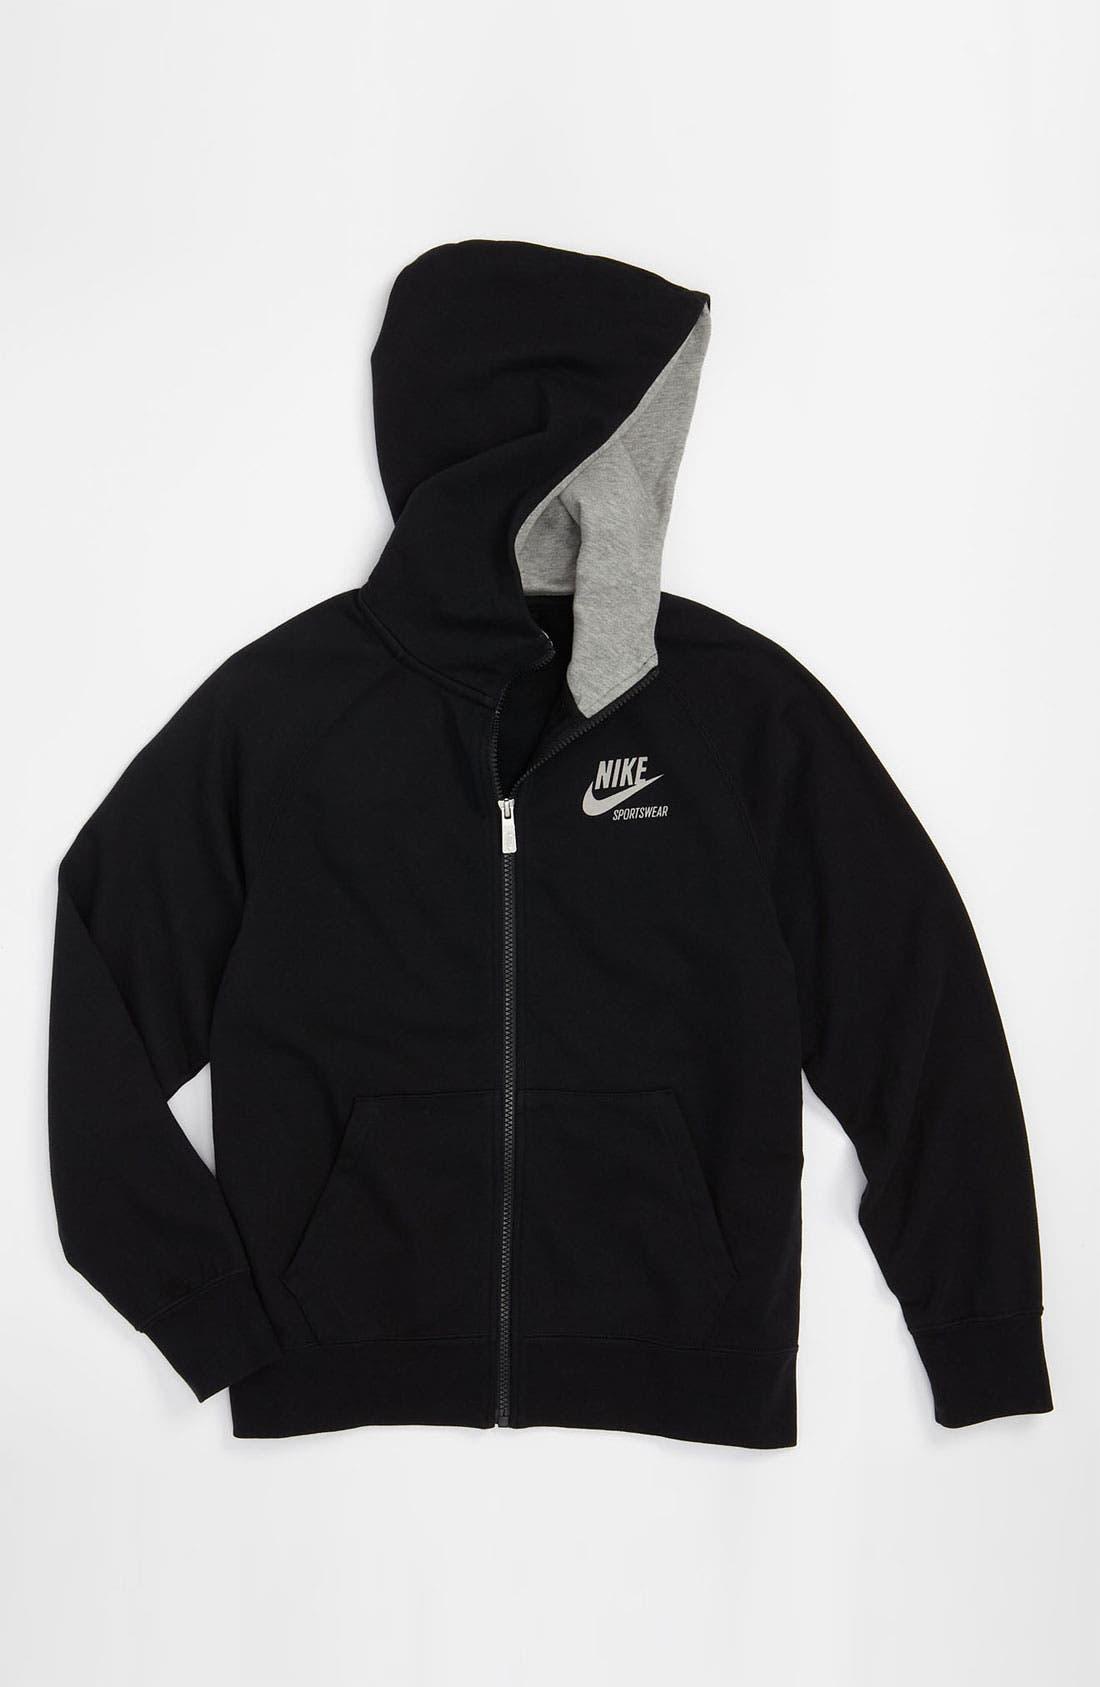 Main Image - Nike 'AW77 FZ' Zip Hoodie (Big Boys)